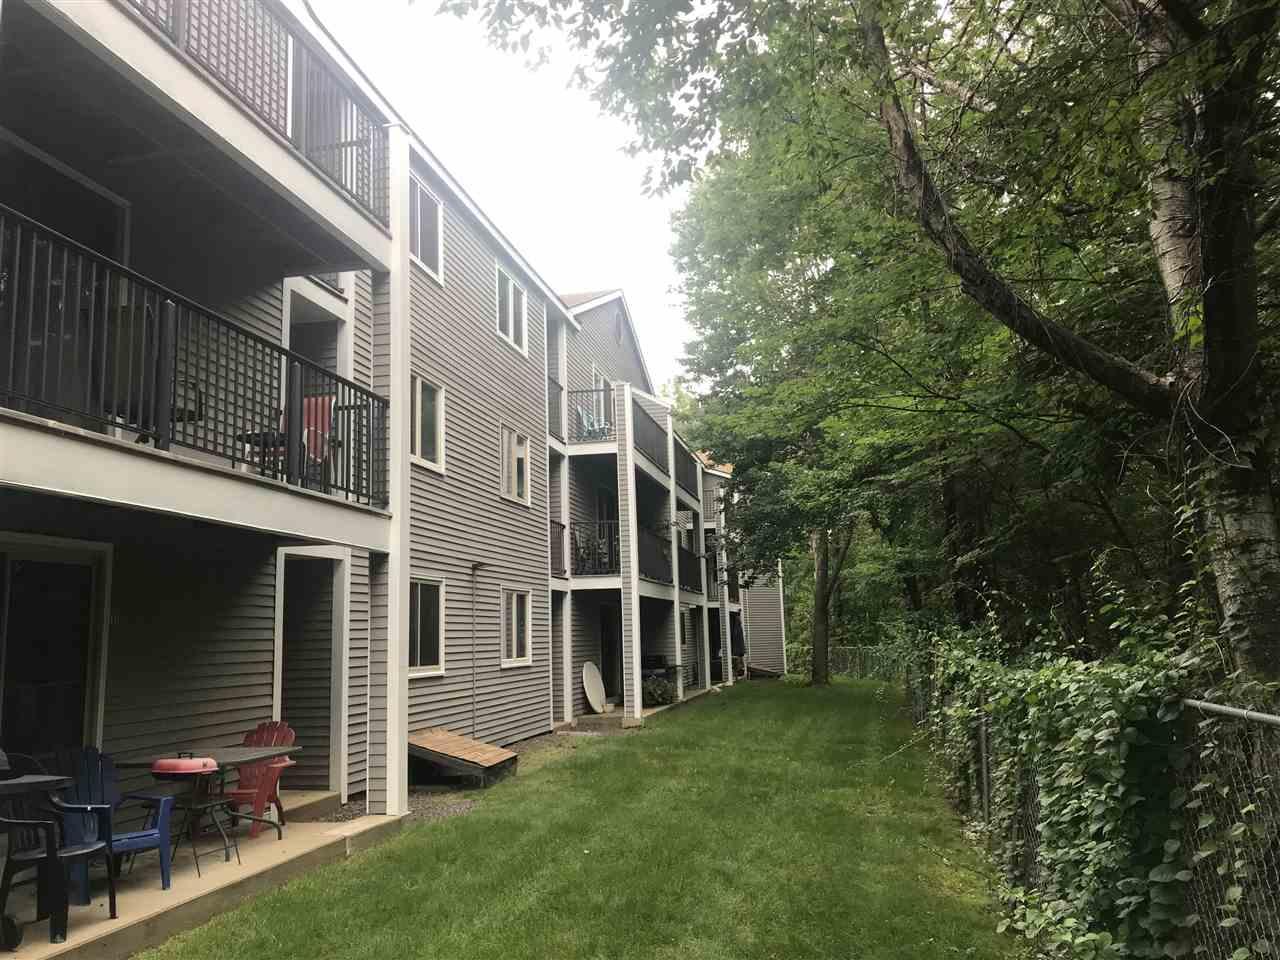 image of Concord NH Condo | sq.ft. 717